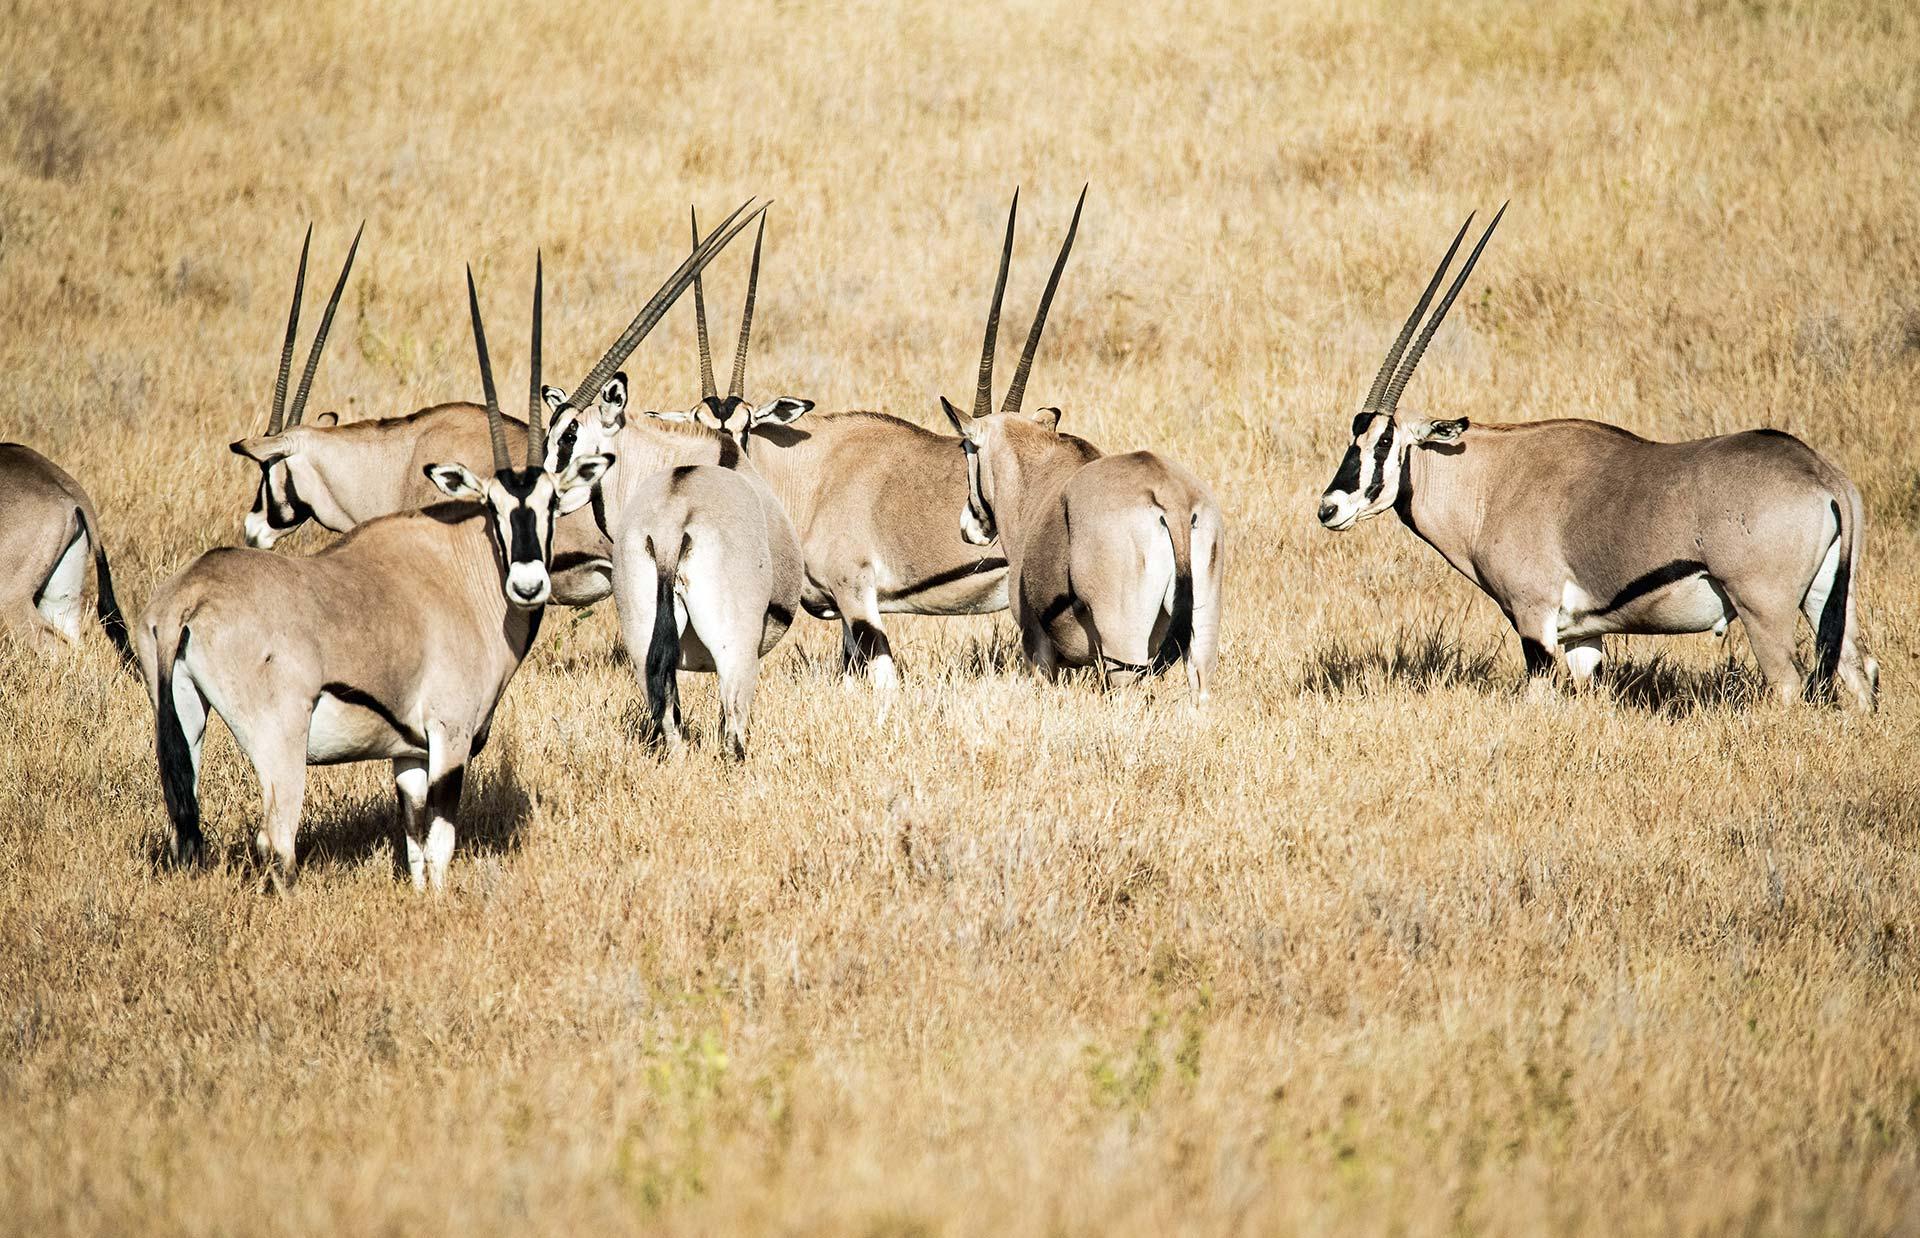 Plusieurs oryx dans la savane